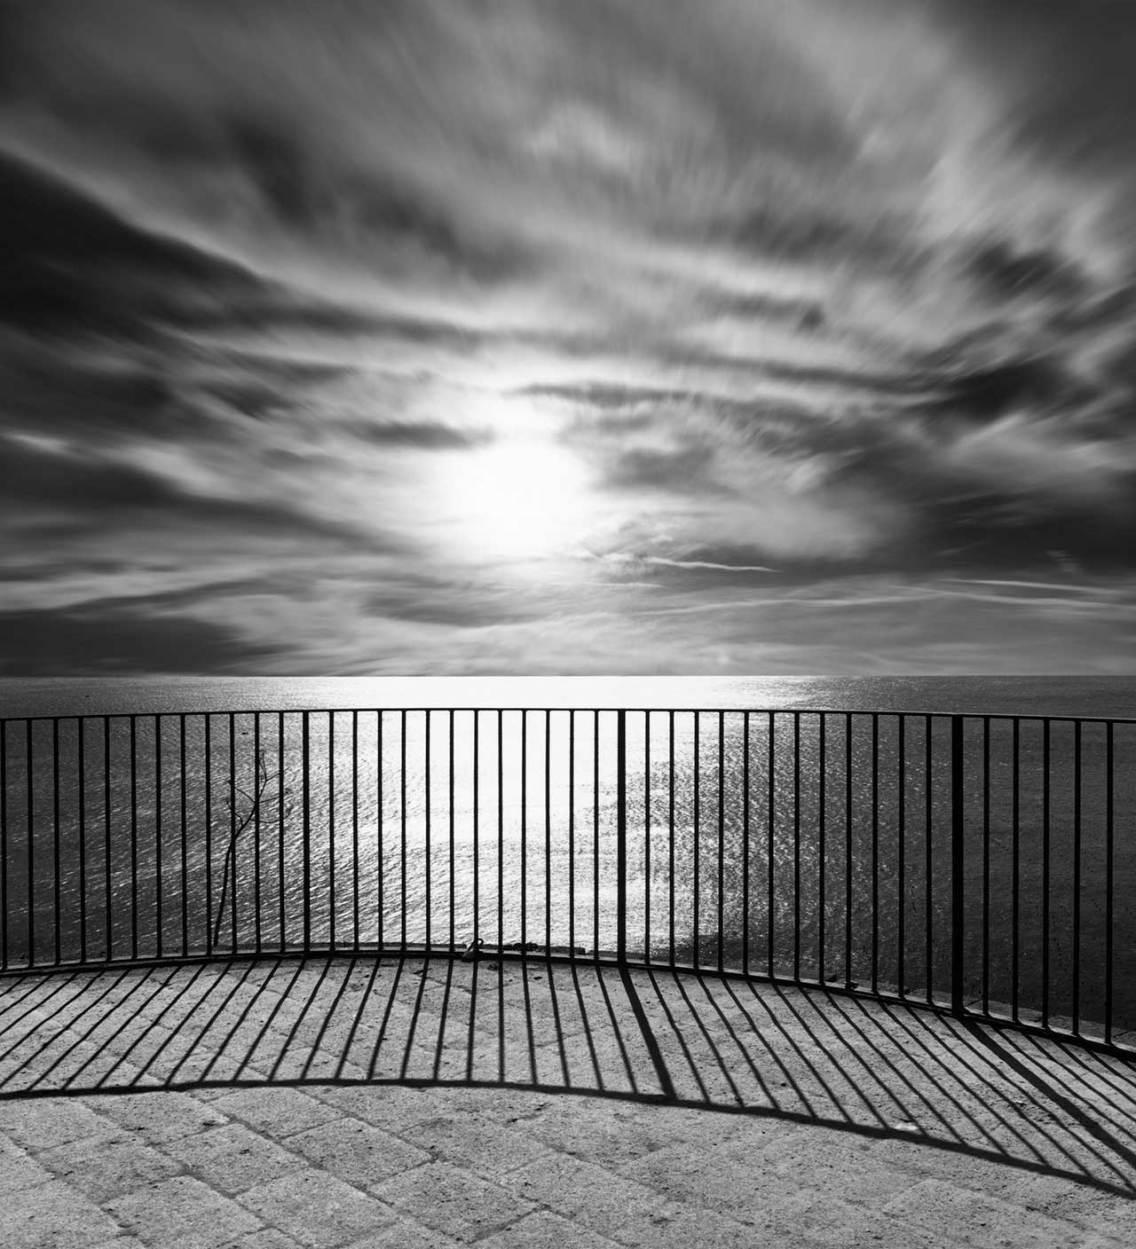 Marelux, Opera nr.2 - © Mimmo Jodice